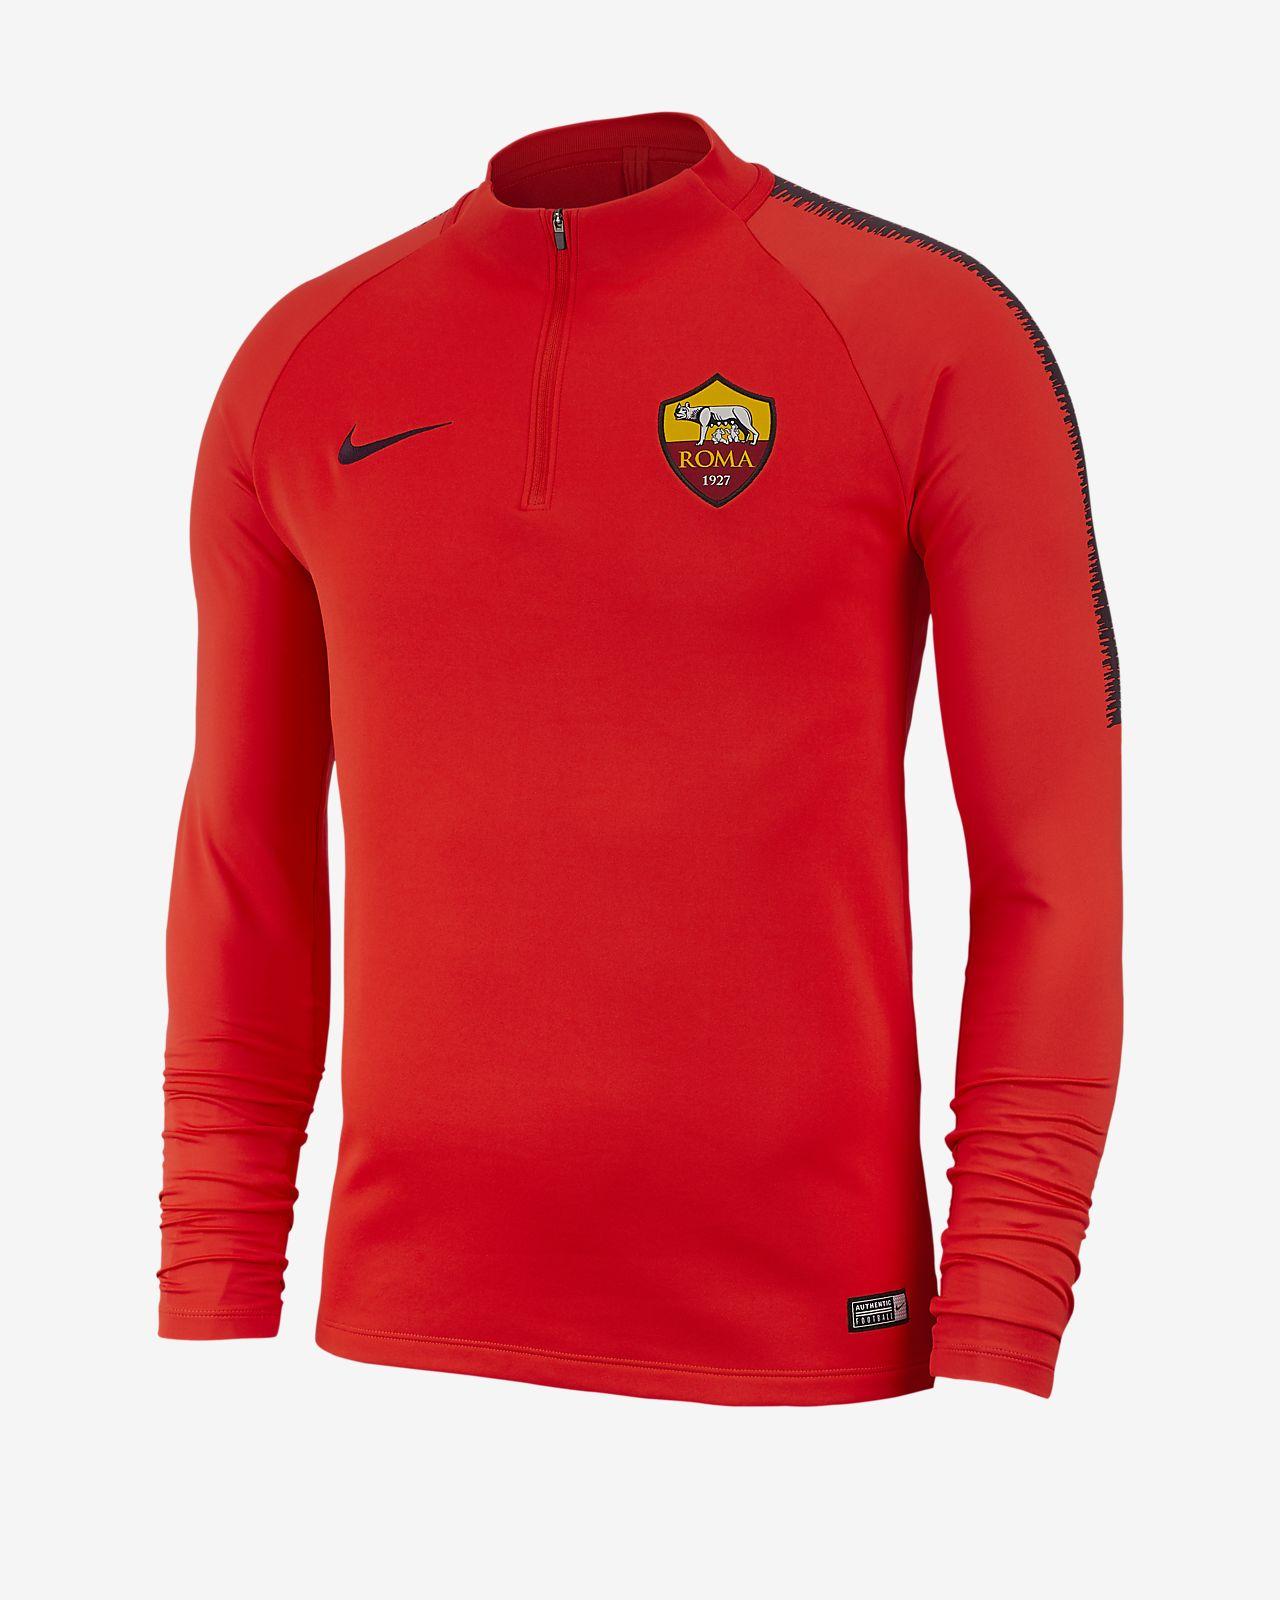 A.S. Roma Dri-FIT Squad Drill Men's Long-Sleeve Football Top